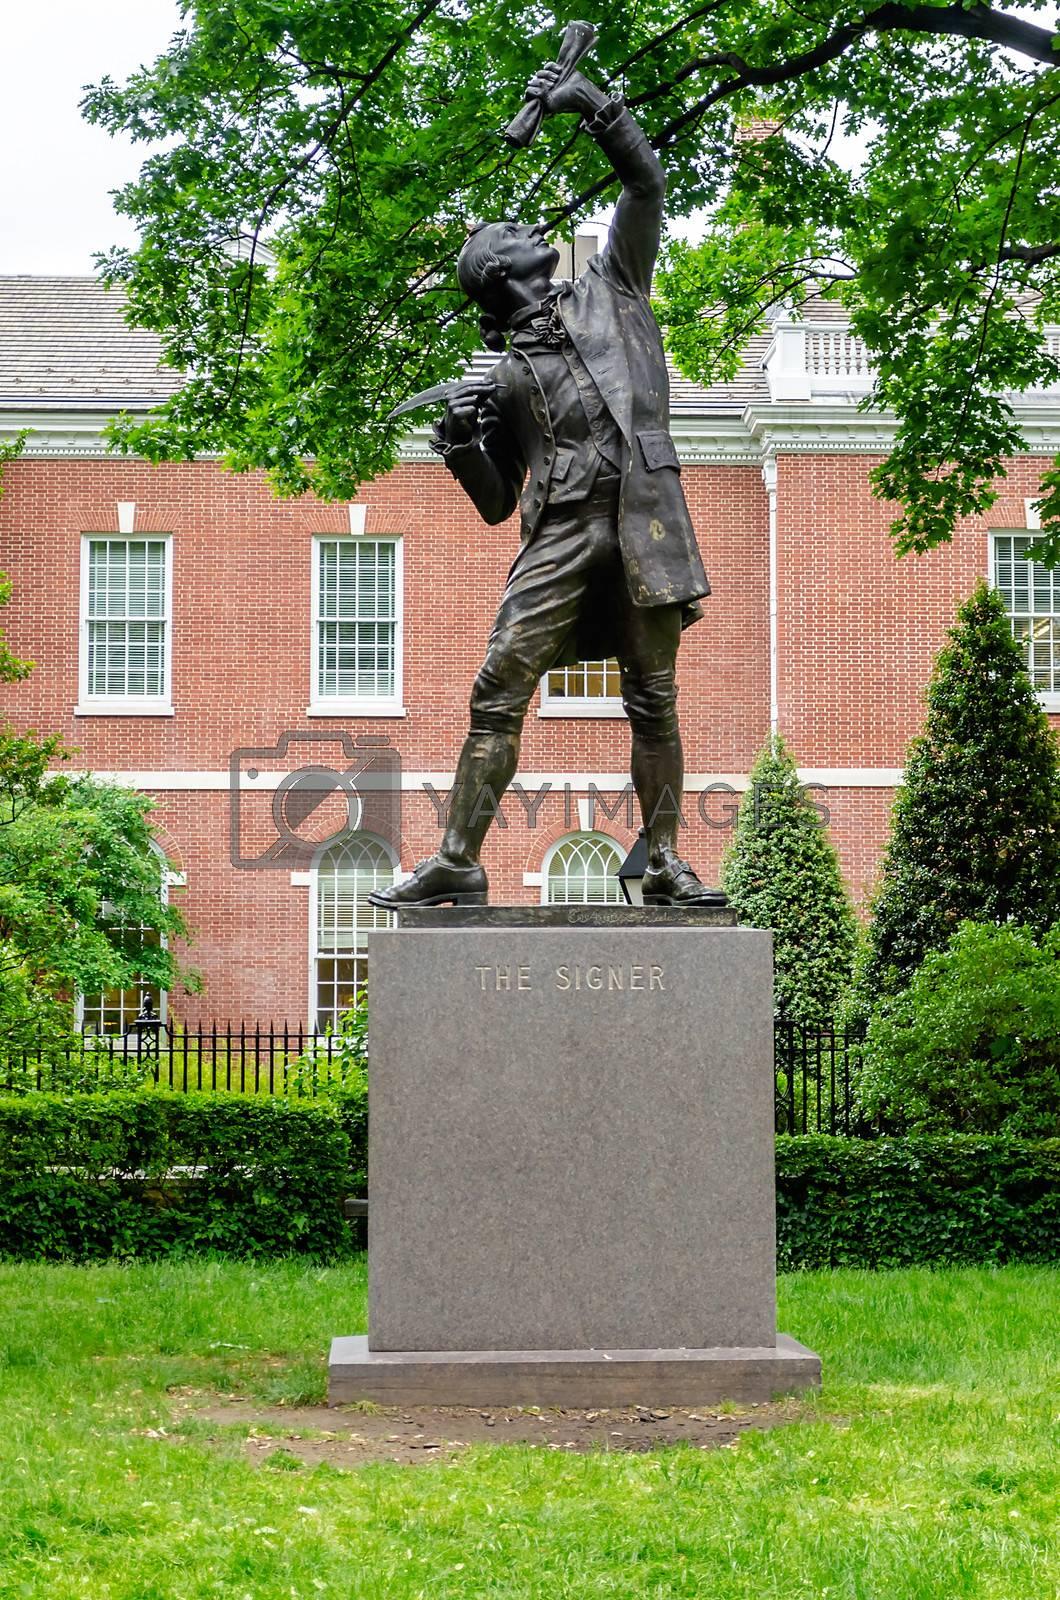 The Signer Statue, Philadelphia, USA